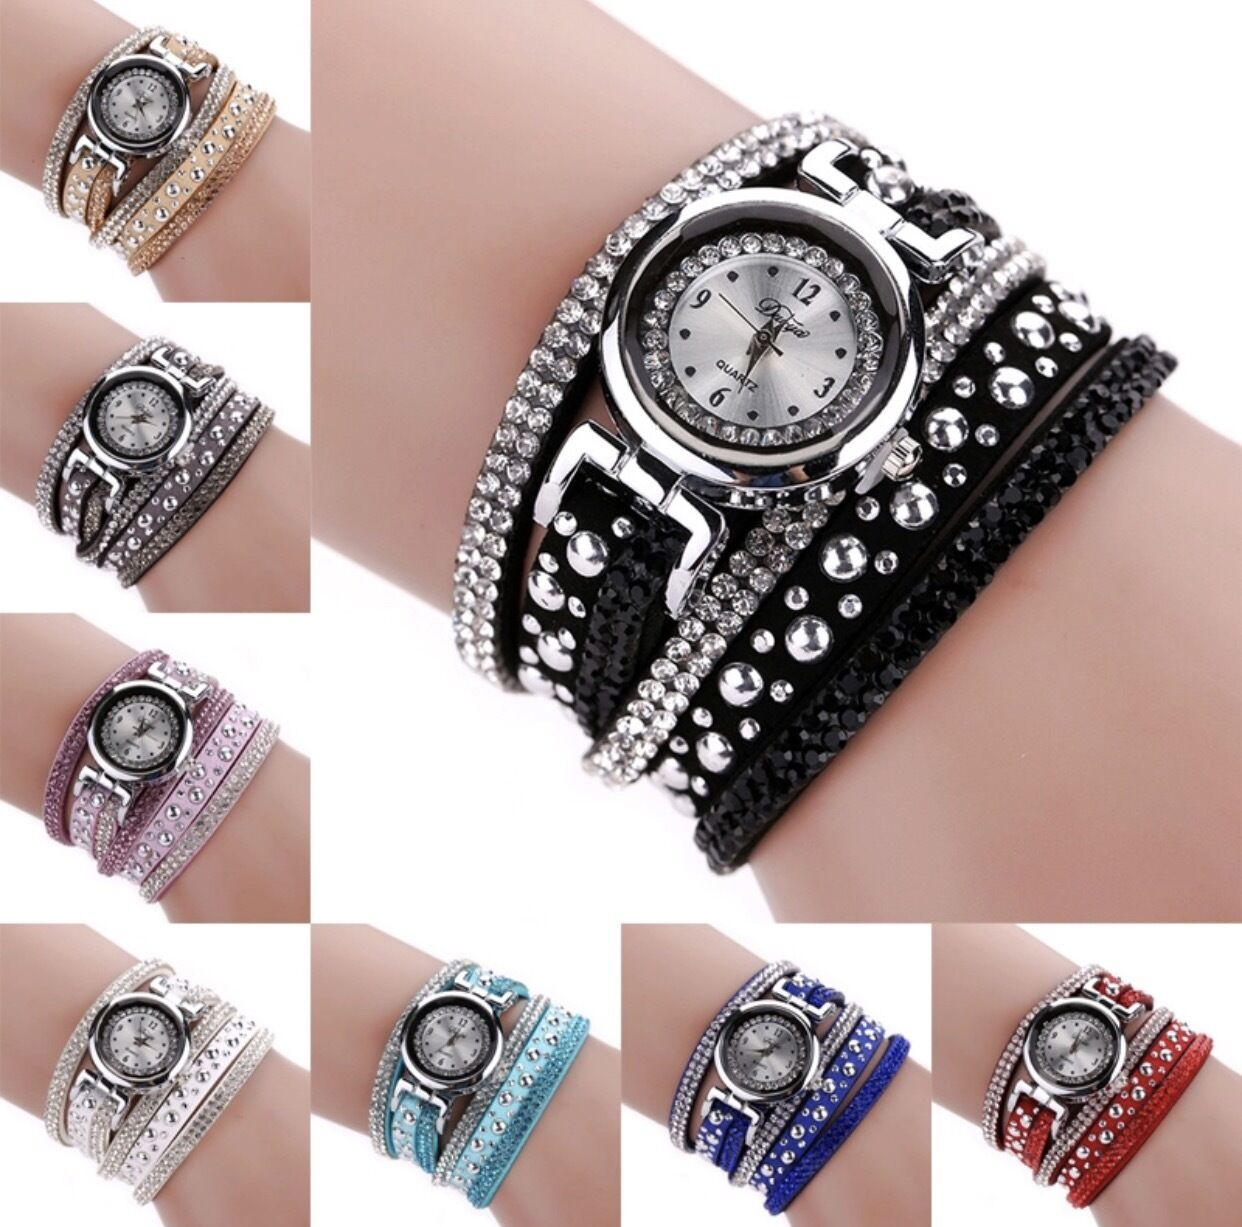 Armbanduhr Damenuhr Uhr Armband Wickelarmband silber Strass Glitzer Nieten edel